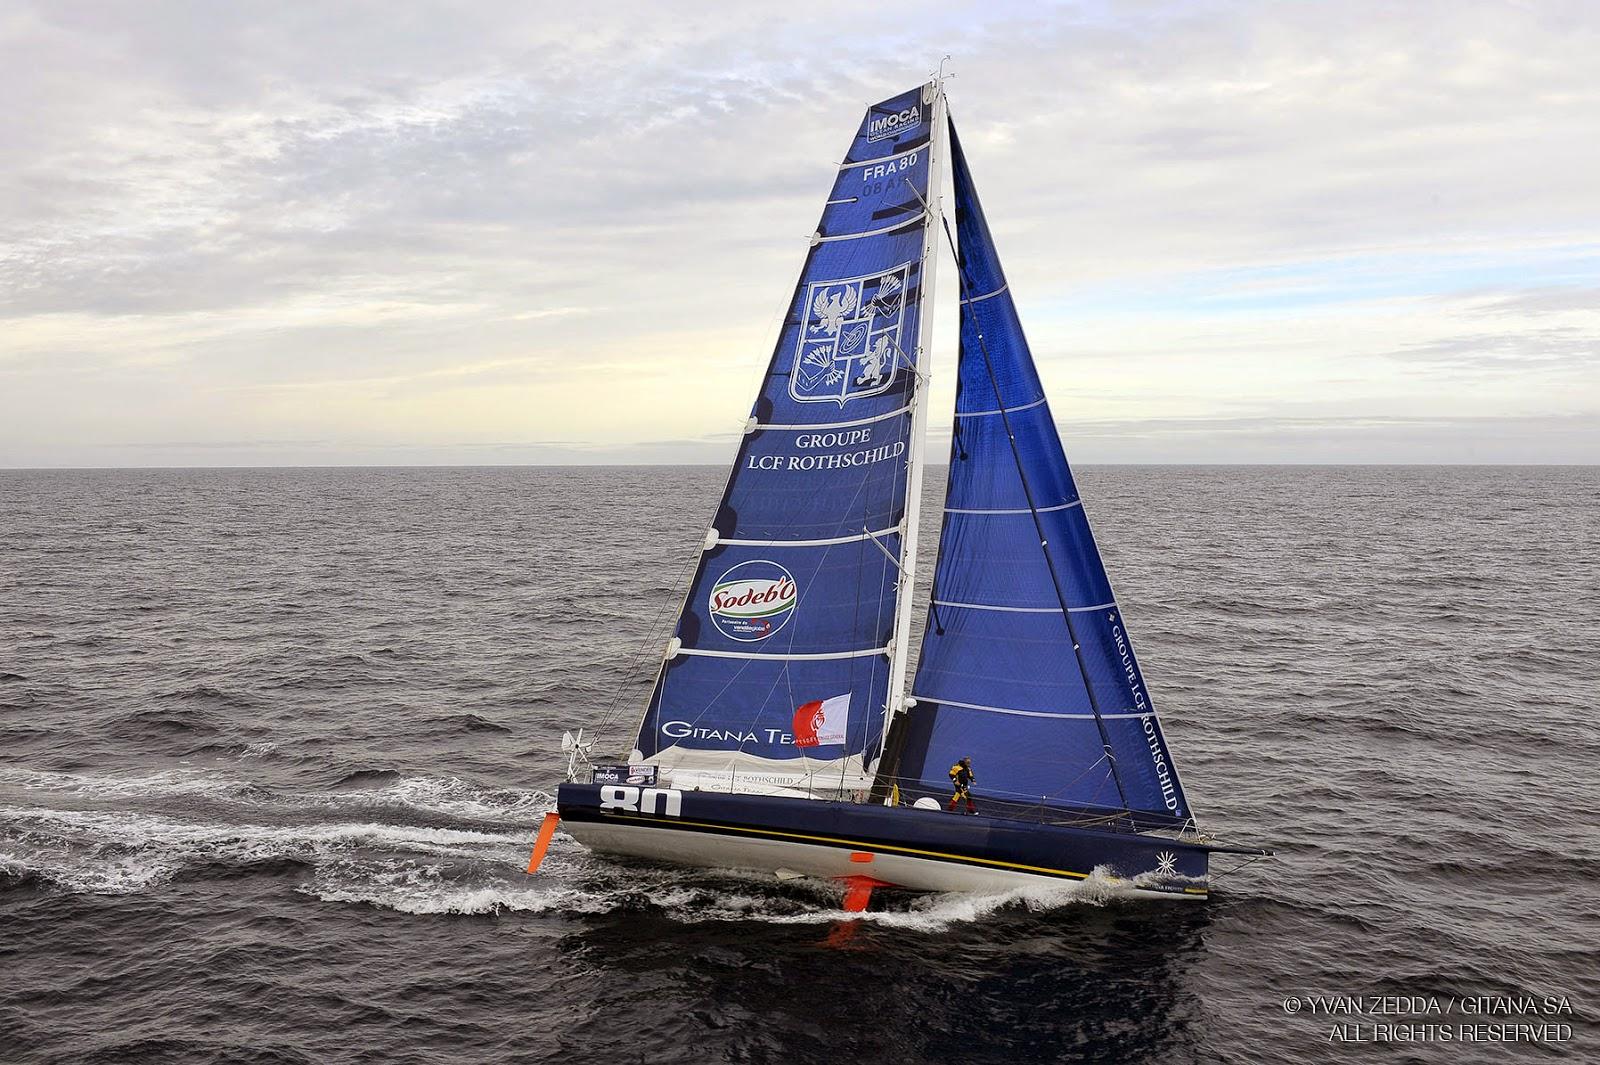 Gitana Eighty sur le Vendée Globe 2008, skippé par Loick Peyron